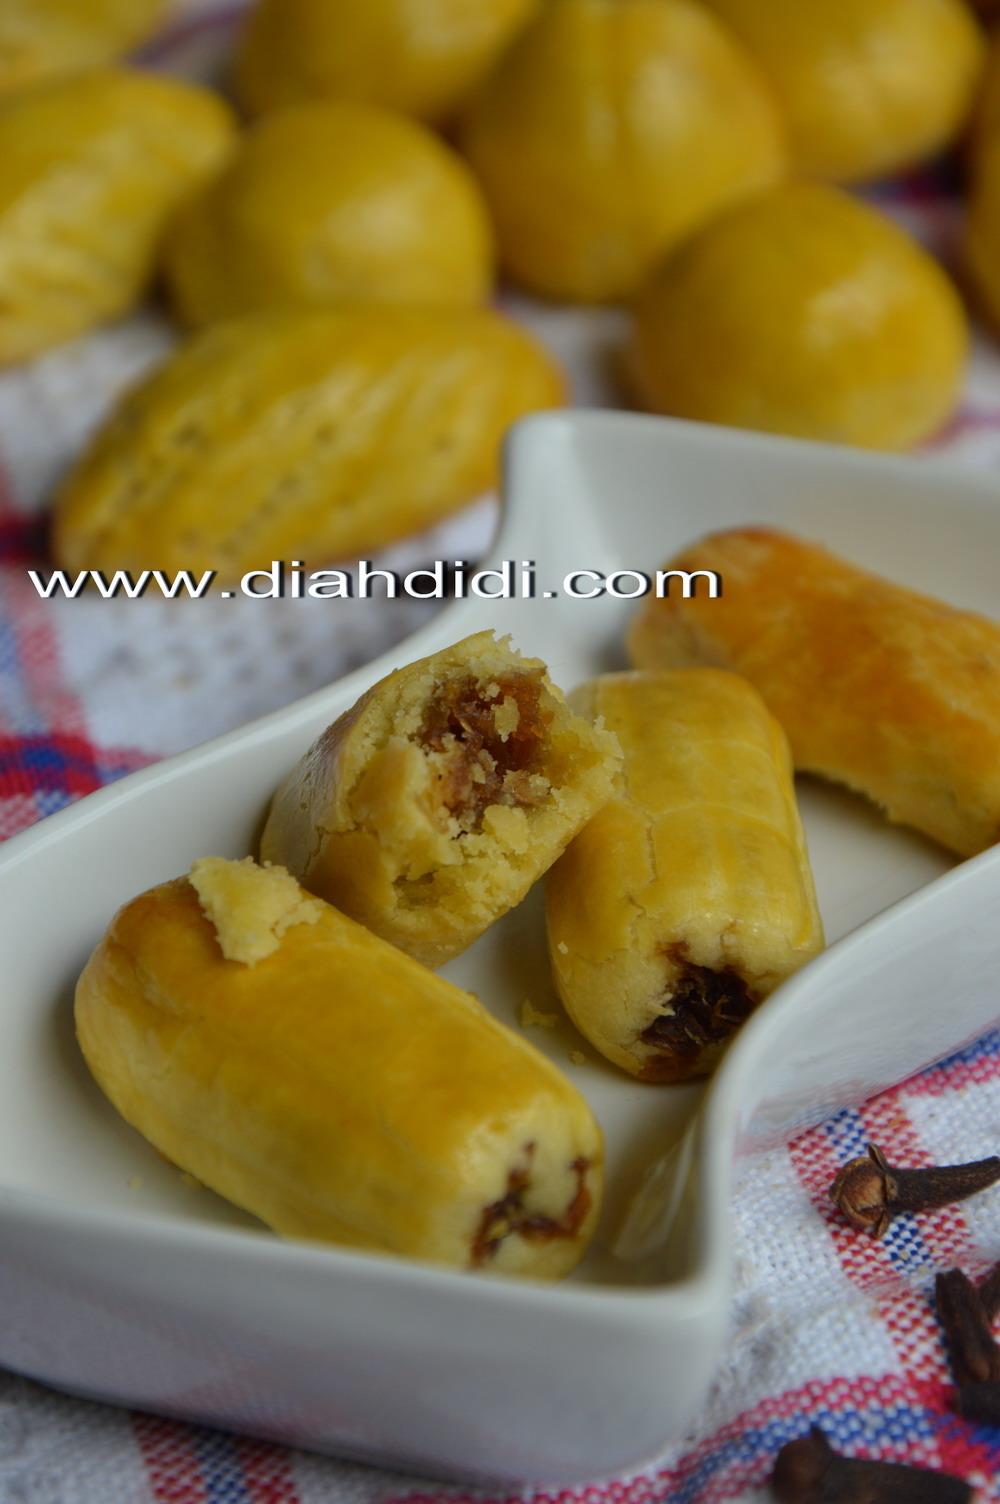 Diah Didis Kitchen Aneka Bentuk Nastar Resep Nastar Ekonomis